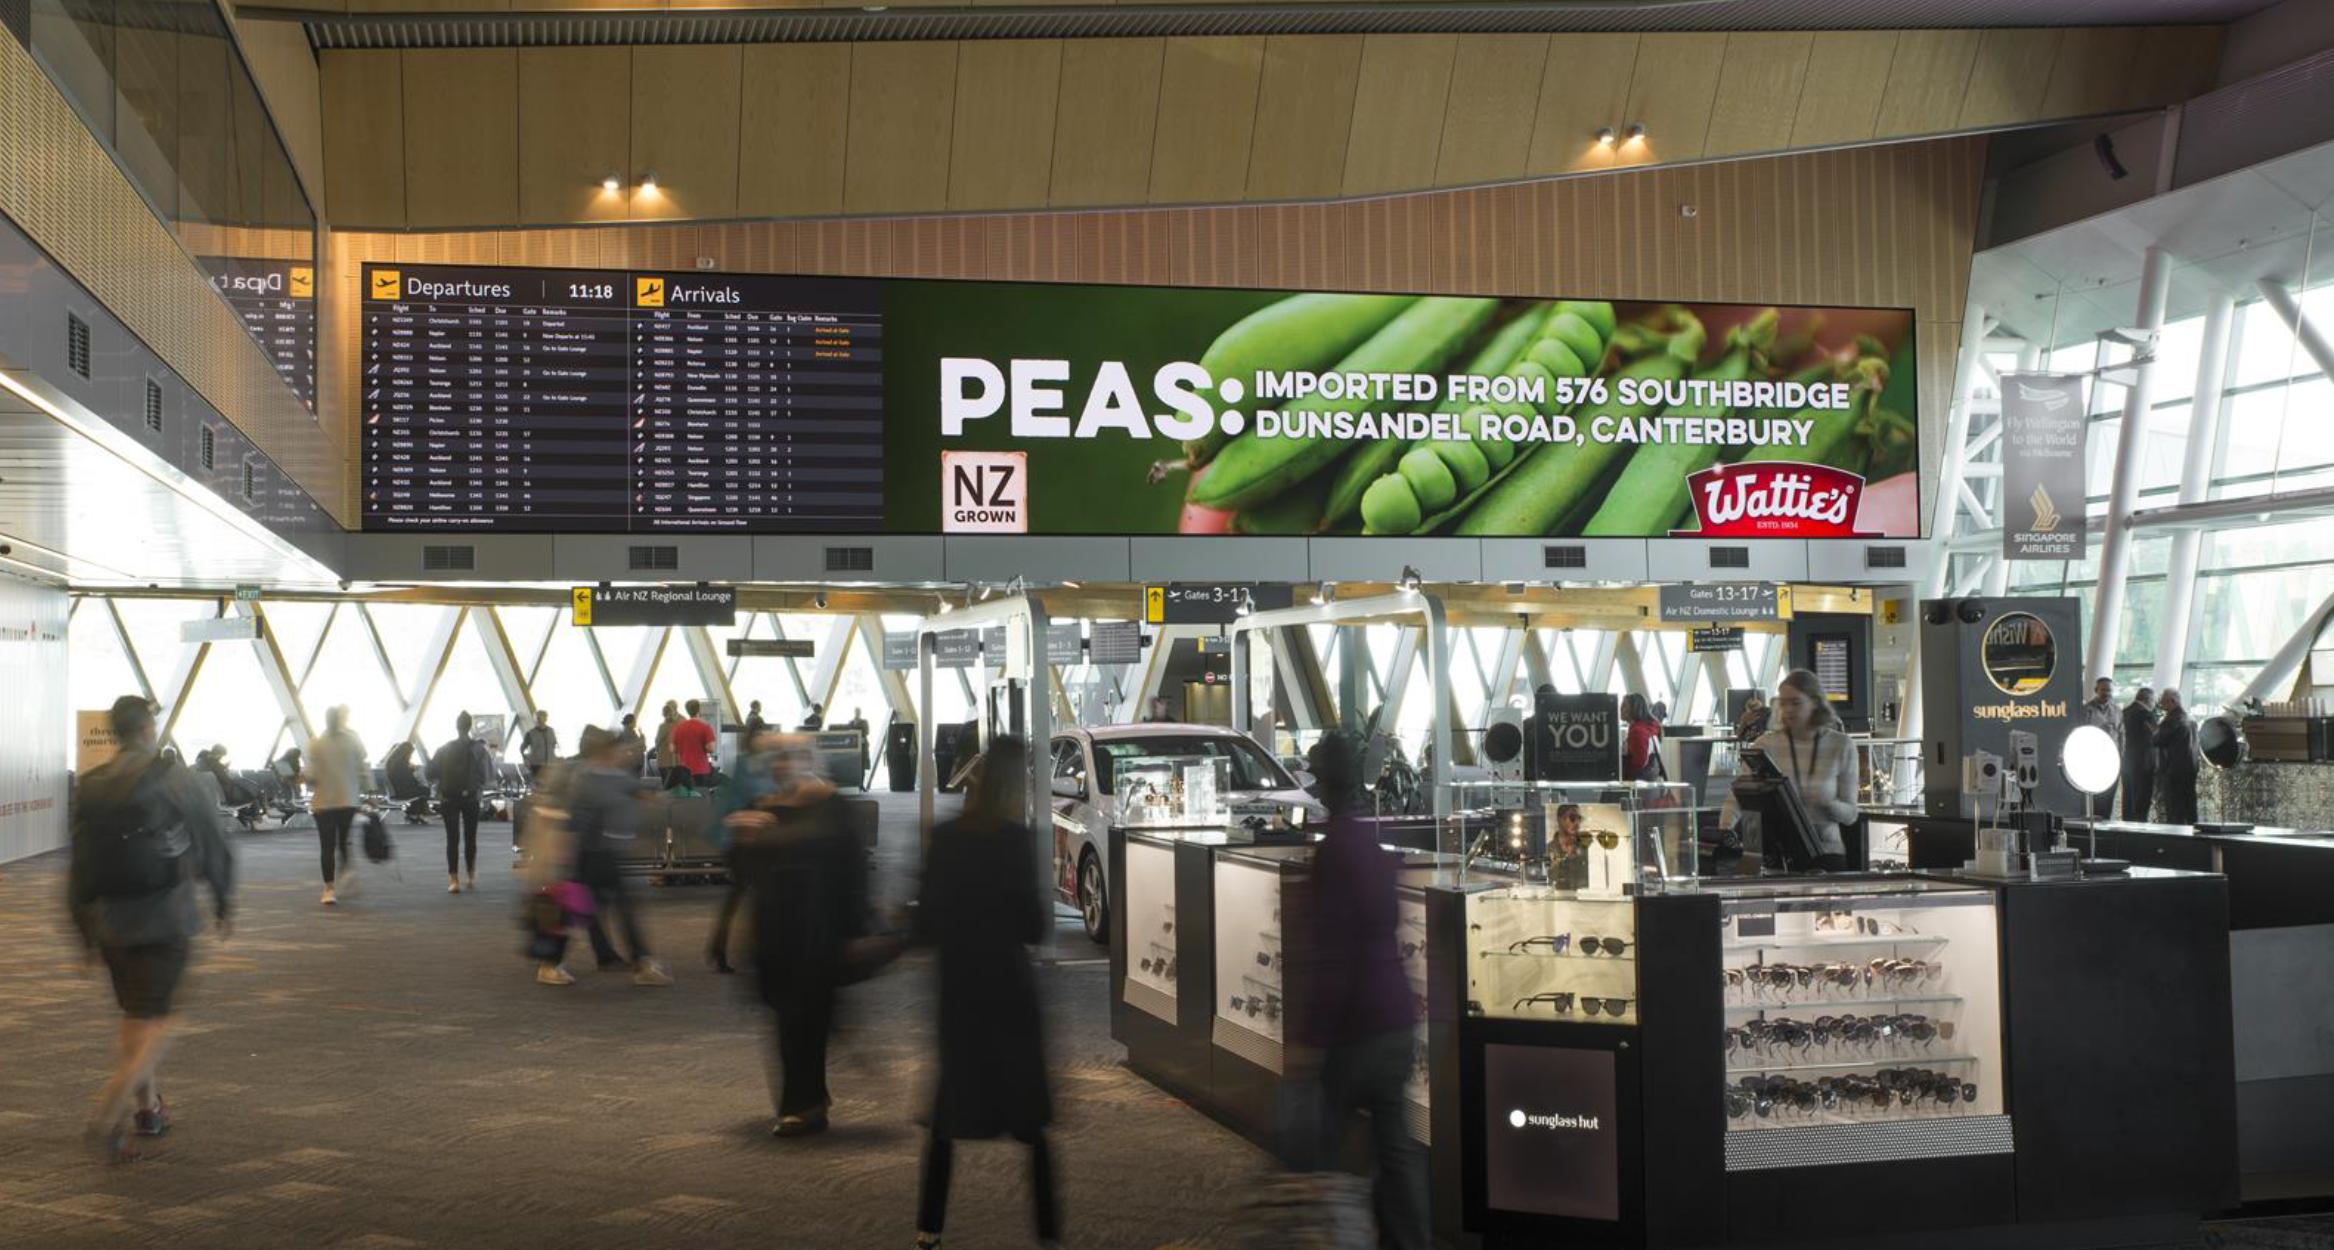 In situ pea billboard Wellington airport